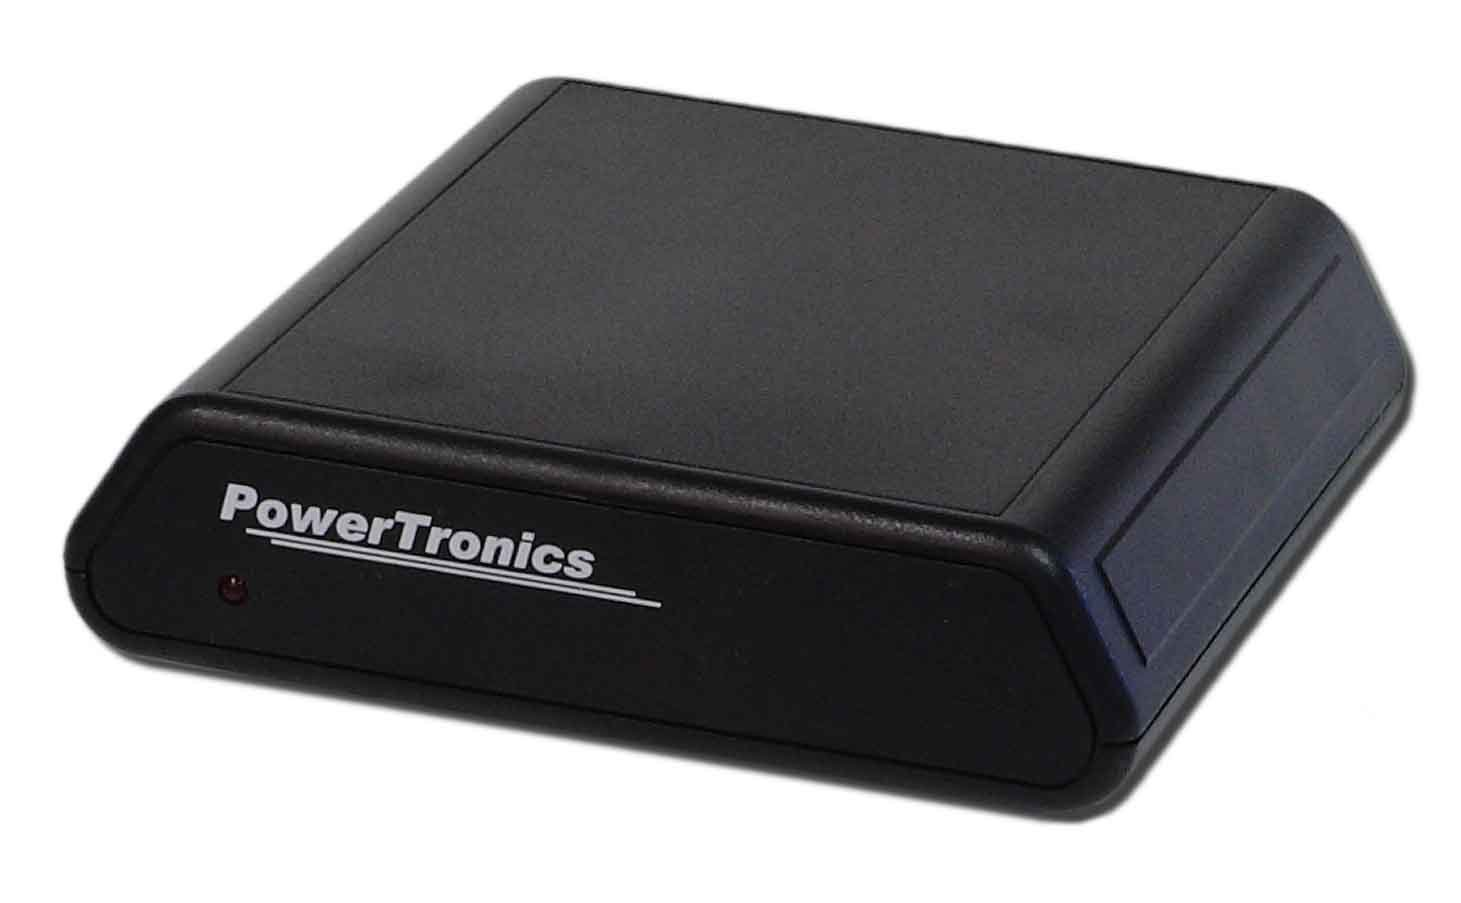 Powertronics PQR D50 Voltage Disturbance Recorder, Black by Powertronics  B001DNLW82